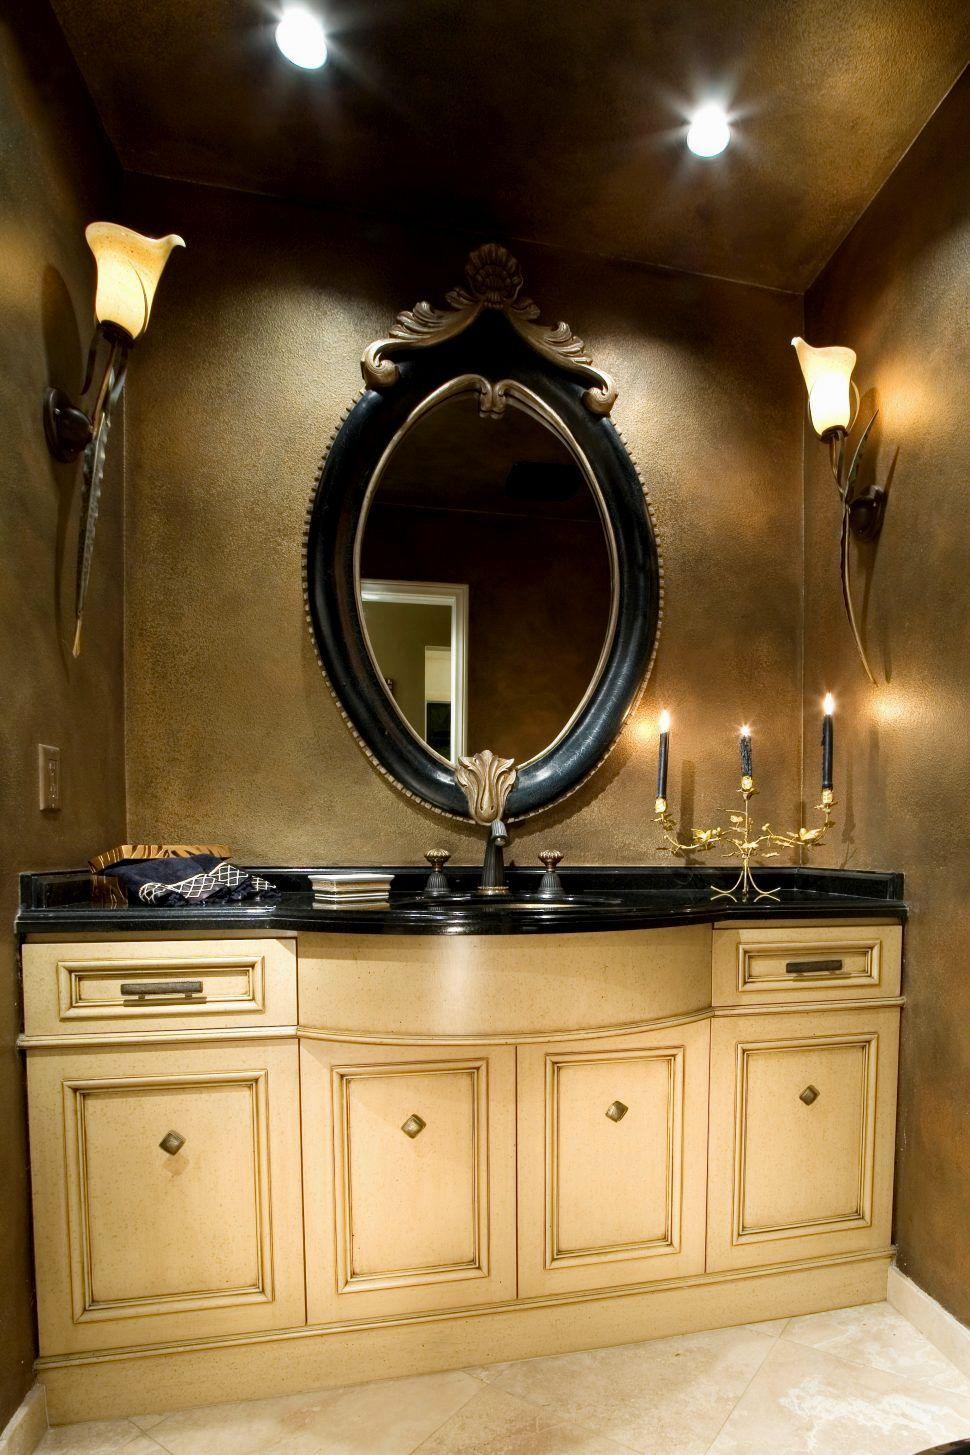 fascinating mirror in the bathroom concept-Lovely Mirror In the Bathroom Model